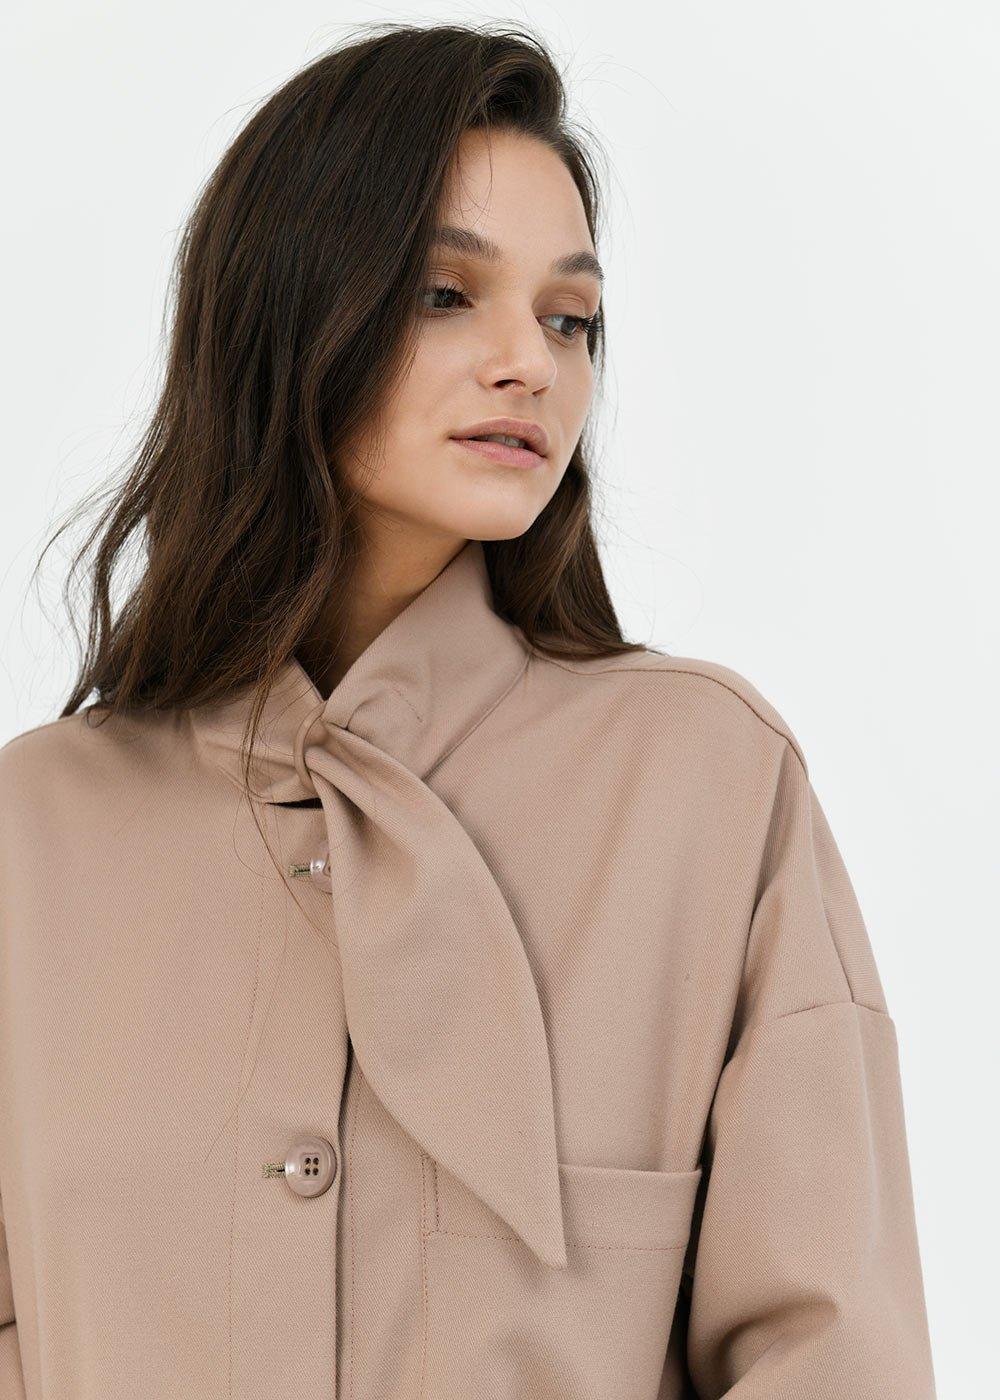 Cyril shirt-model jacket - Powder - Woman